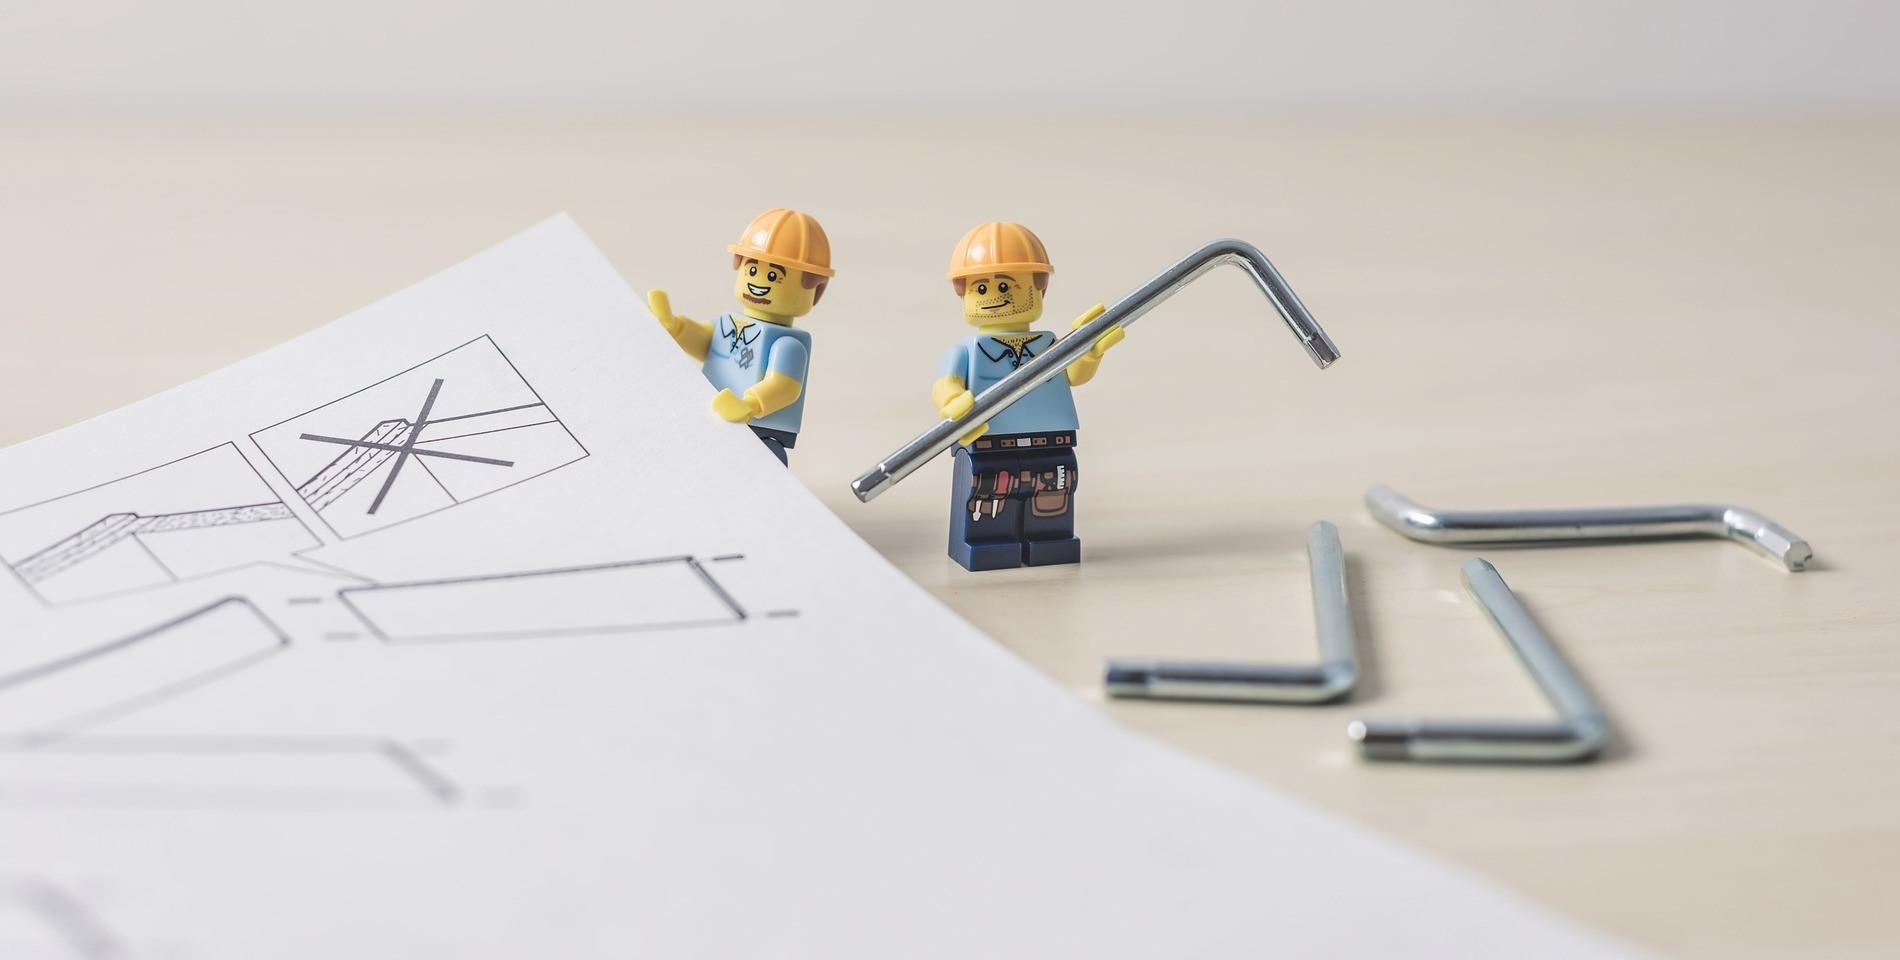 Online Kurs Plattform aufbauen